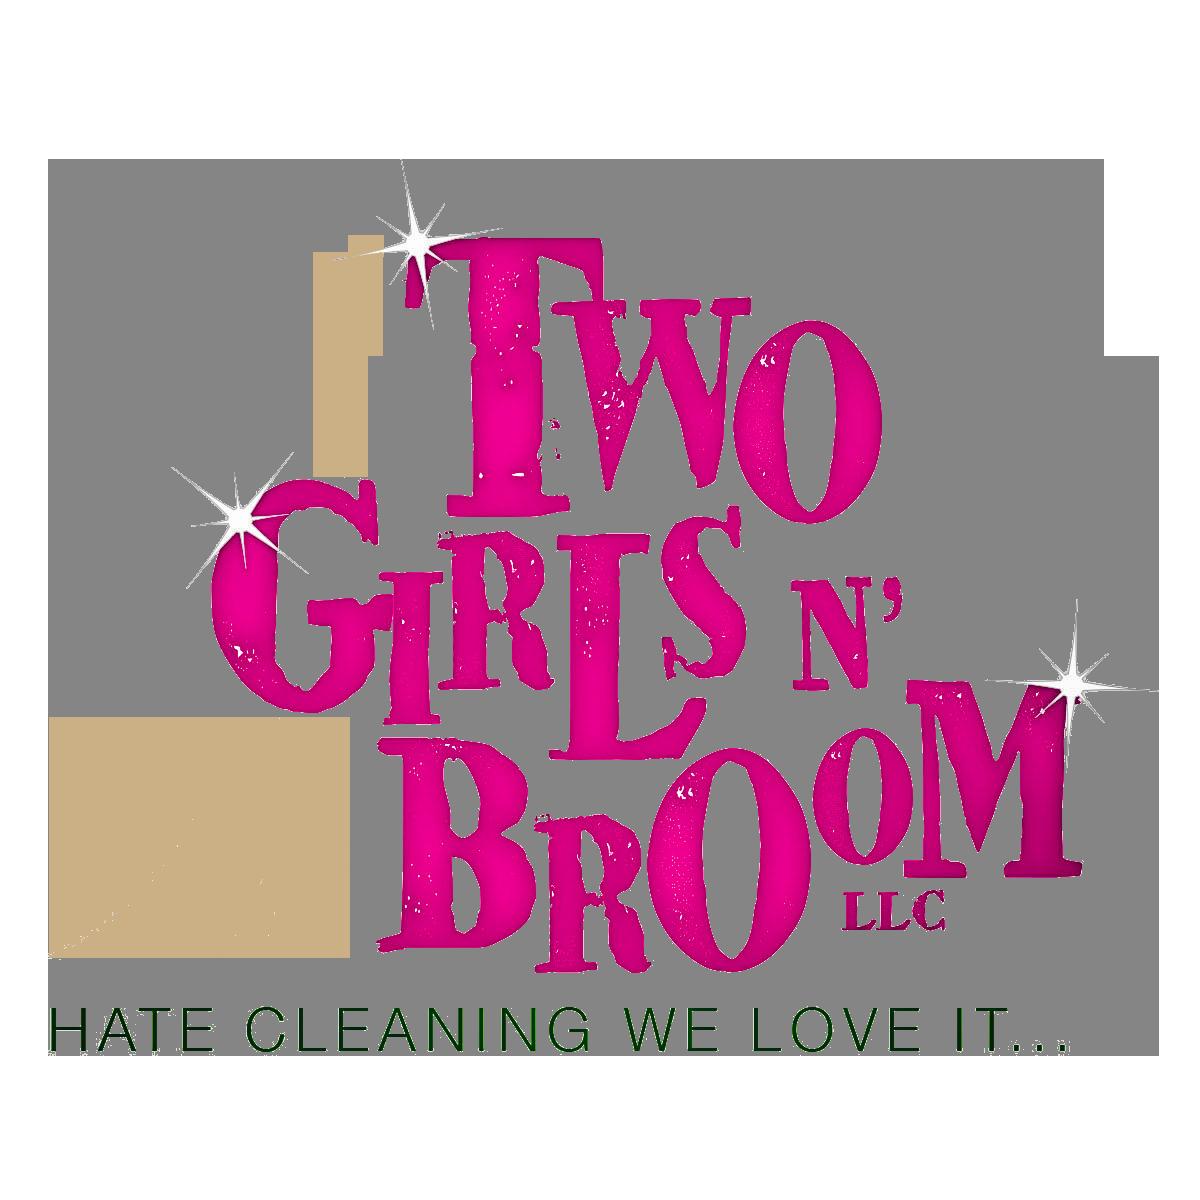 Two Girls N' Broom LLC